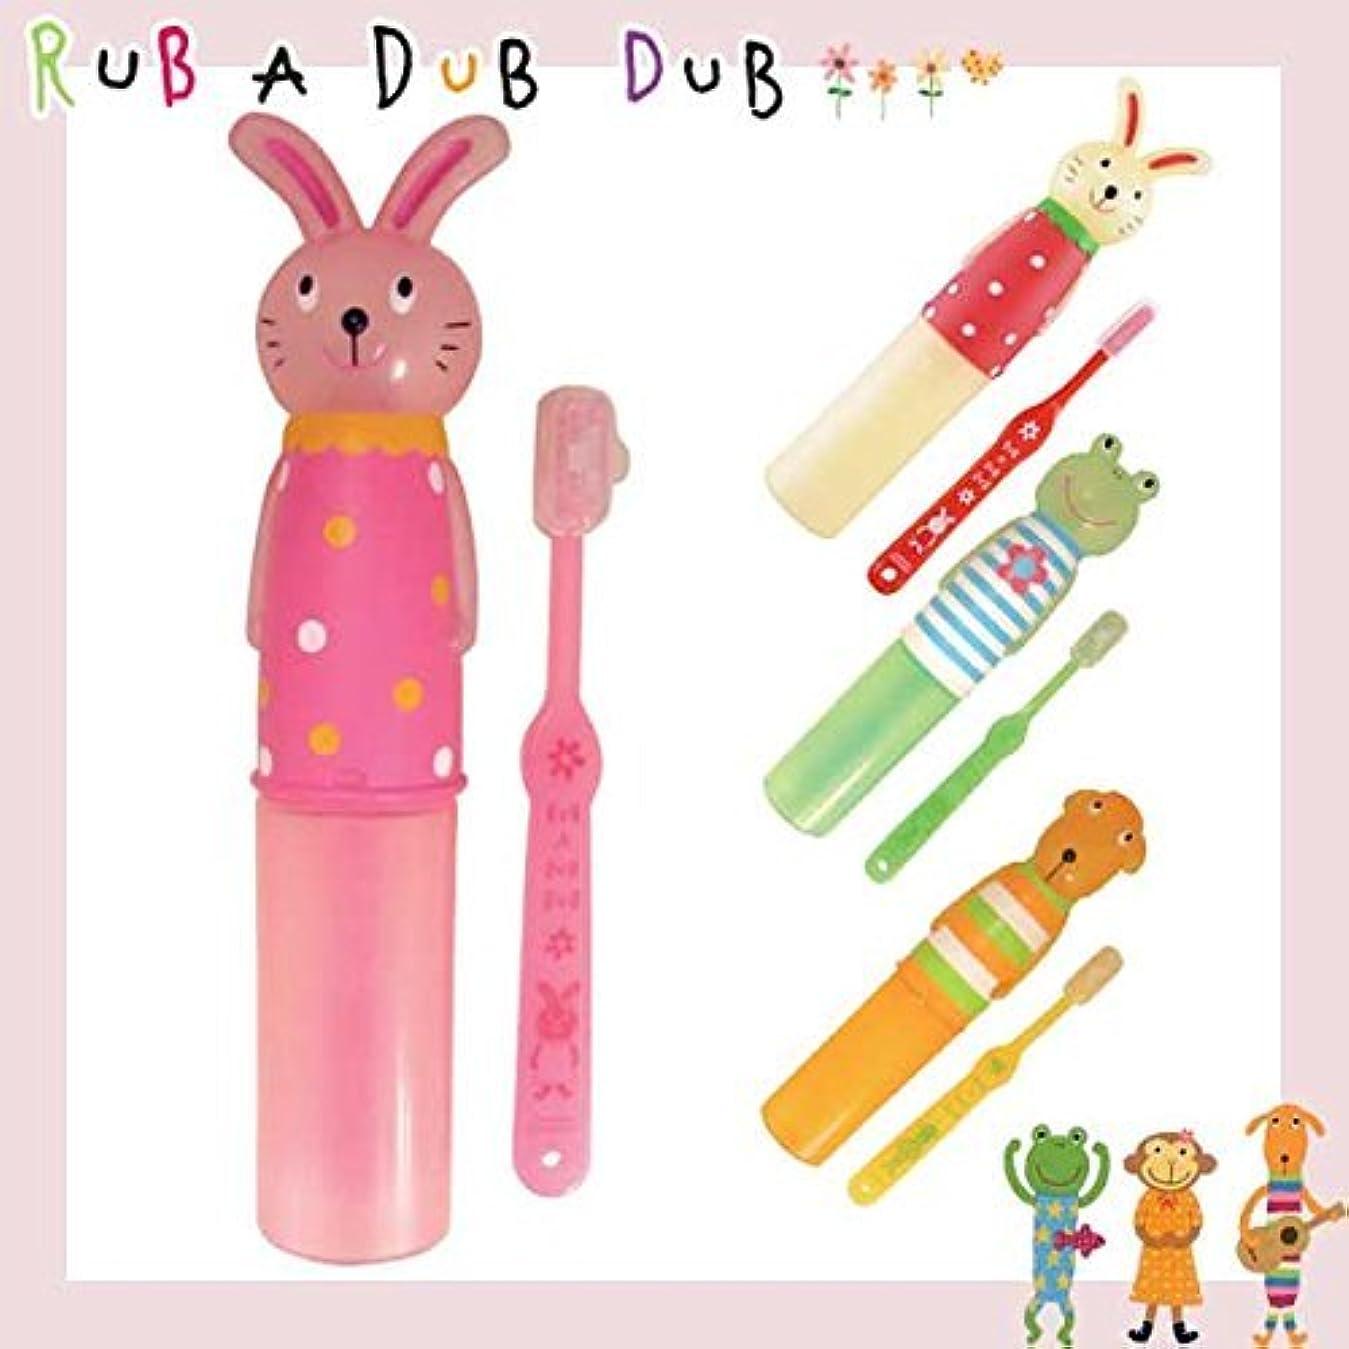 510065/RUB A DUB DUB/R.ハブラシセット(ウサギ)/モンスイユ/ラブアダブダブ/キッズ/ベビー/アニマル/洗面所/歯磨き/ギフト/プレゼント